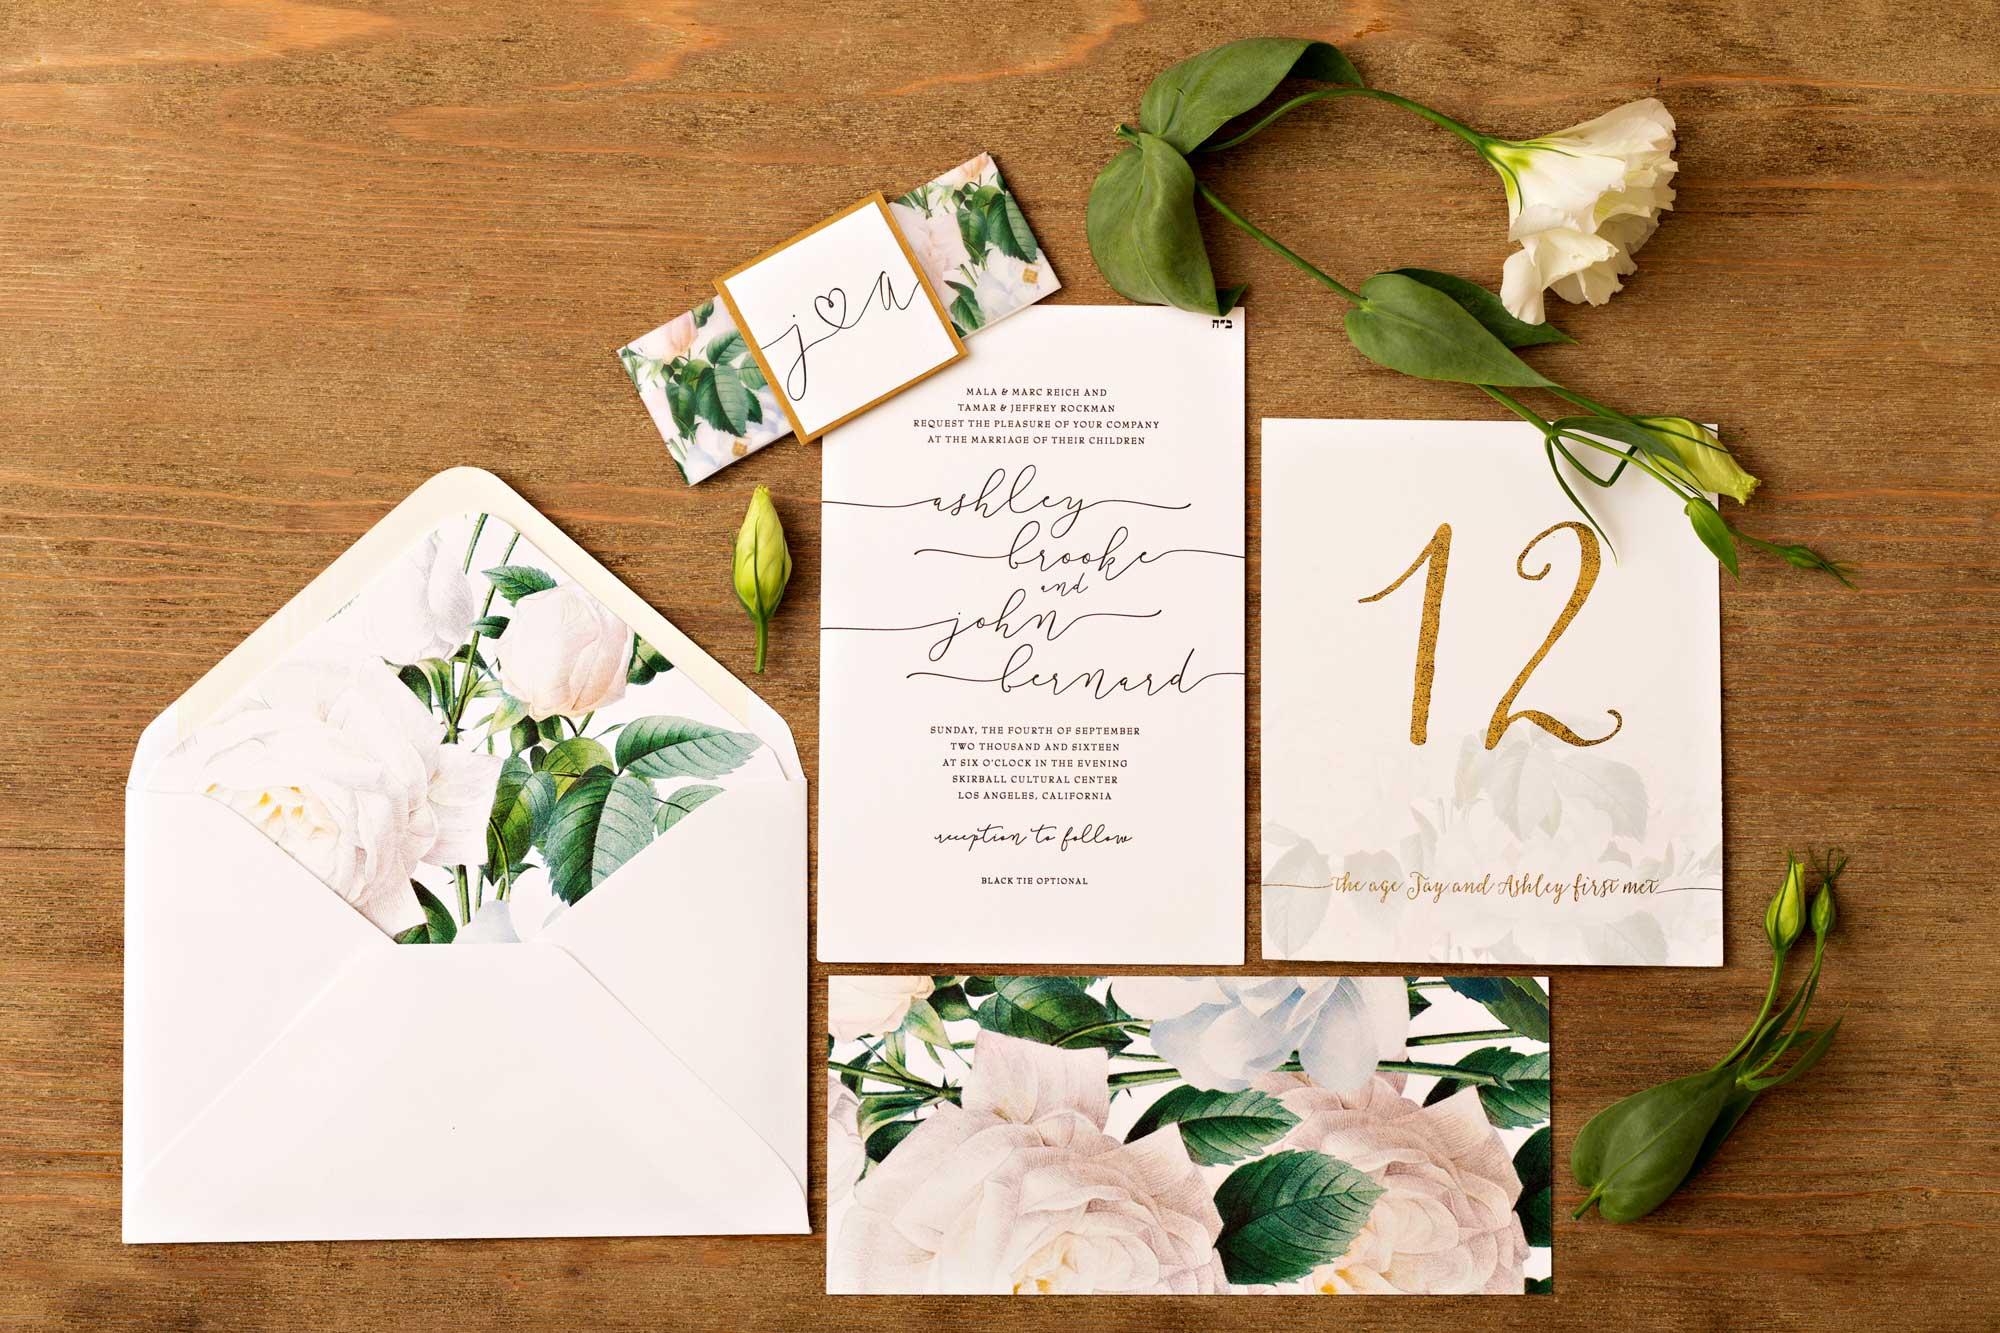 Inside Weddings Spring 2017 issue flower print wedding invitation suite envelope liner